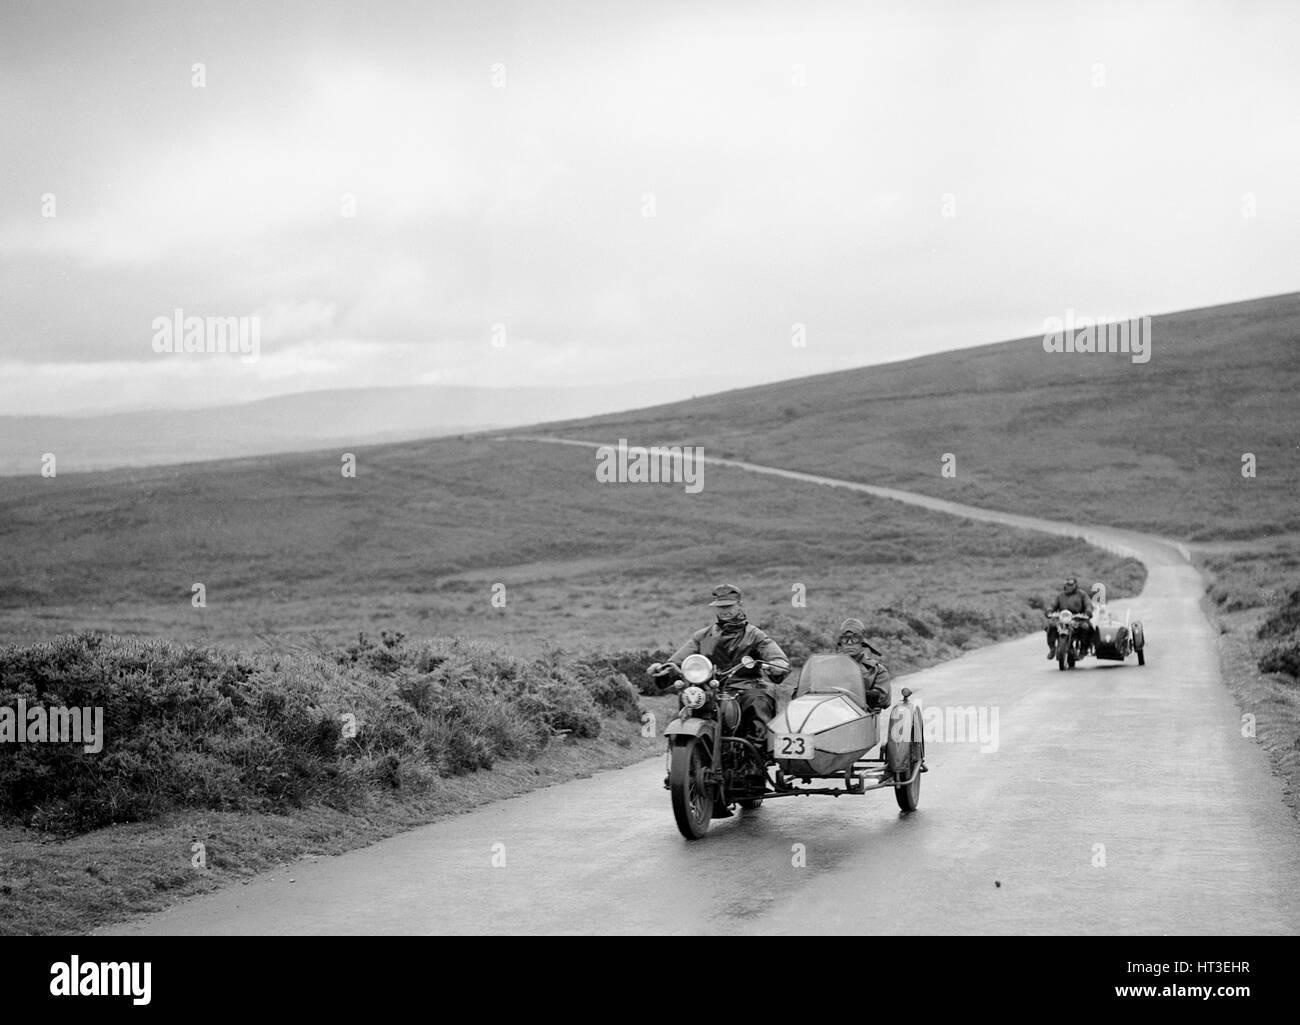 1208 cc Harley-Davidson and sidecar of RW Praill, winner of a silver award, MCC Torquay Rally, 1937. Artist: Bill - Stock Image